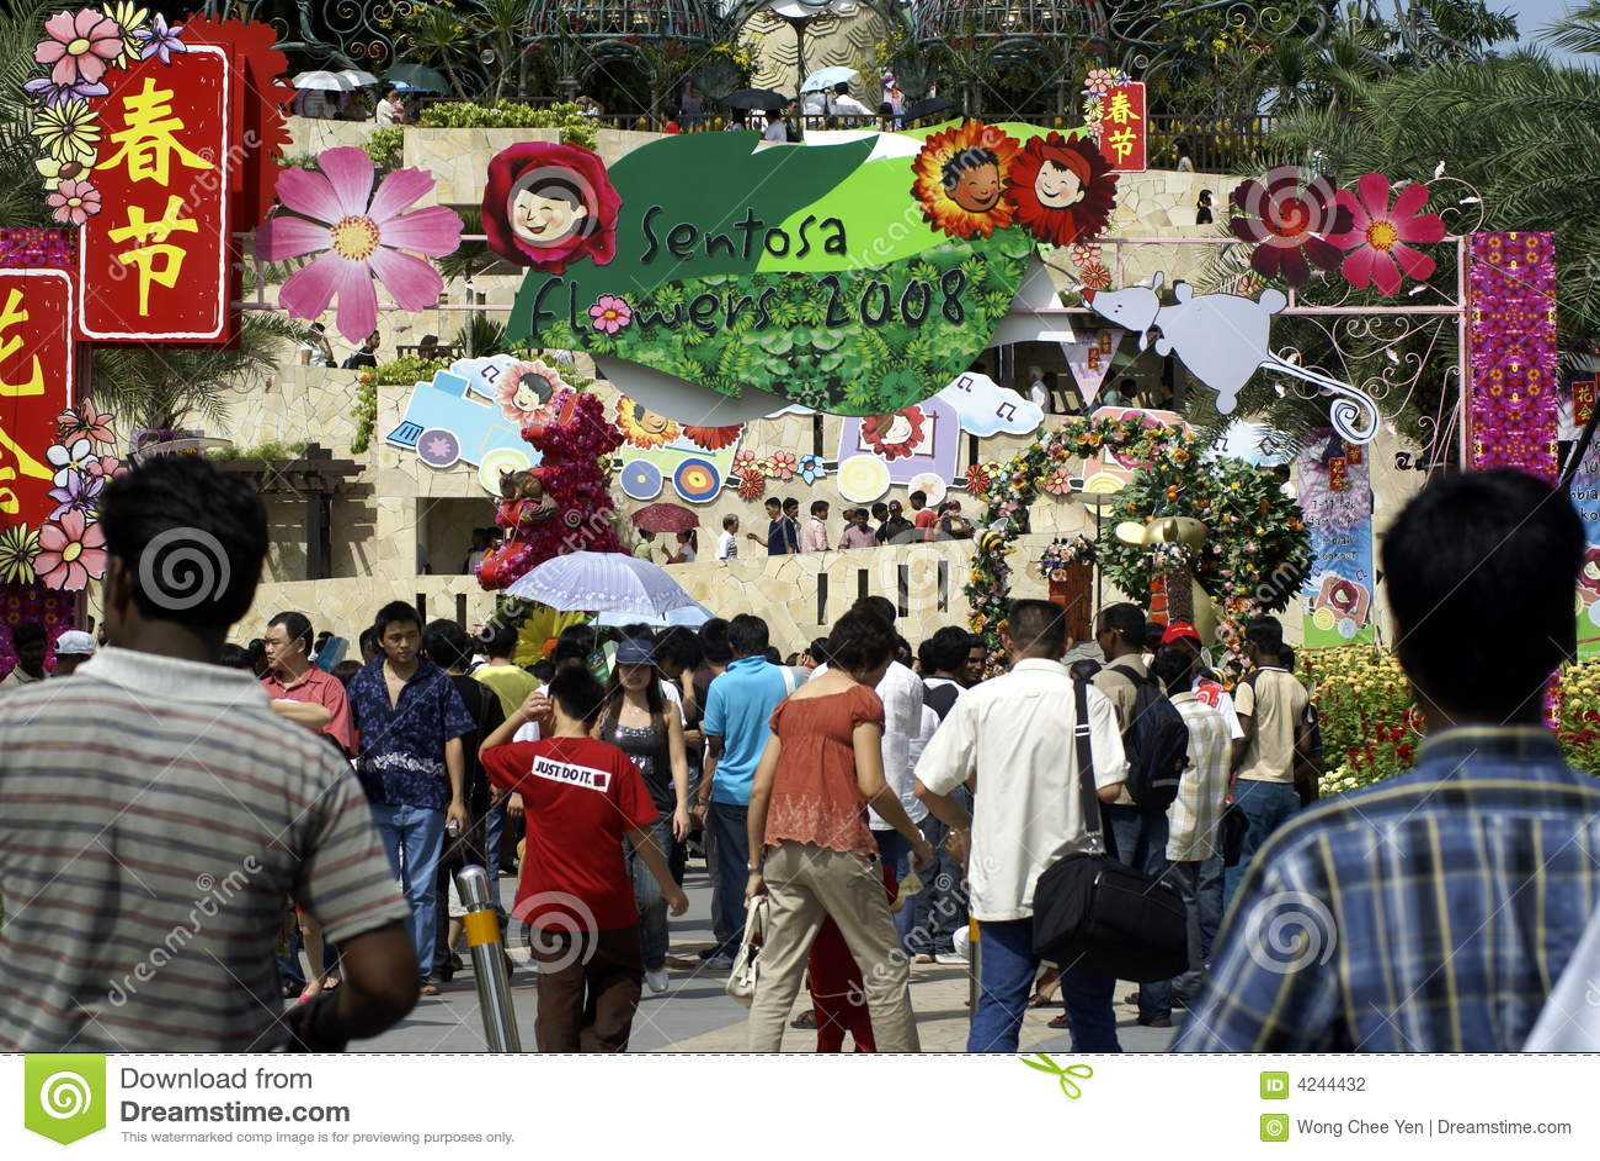 Festivalen 2008 blommar sentosa